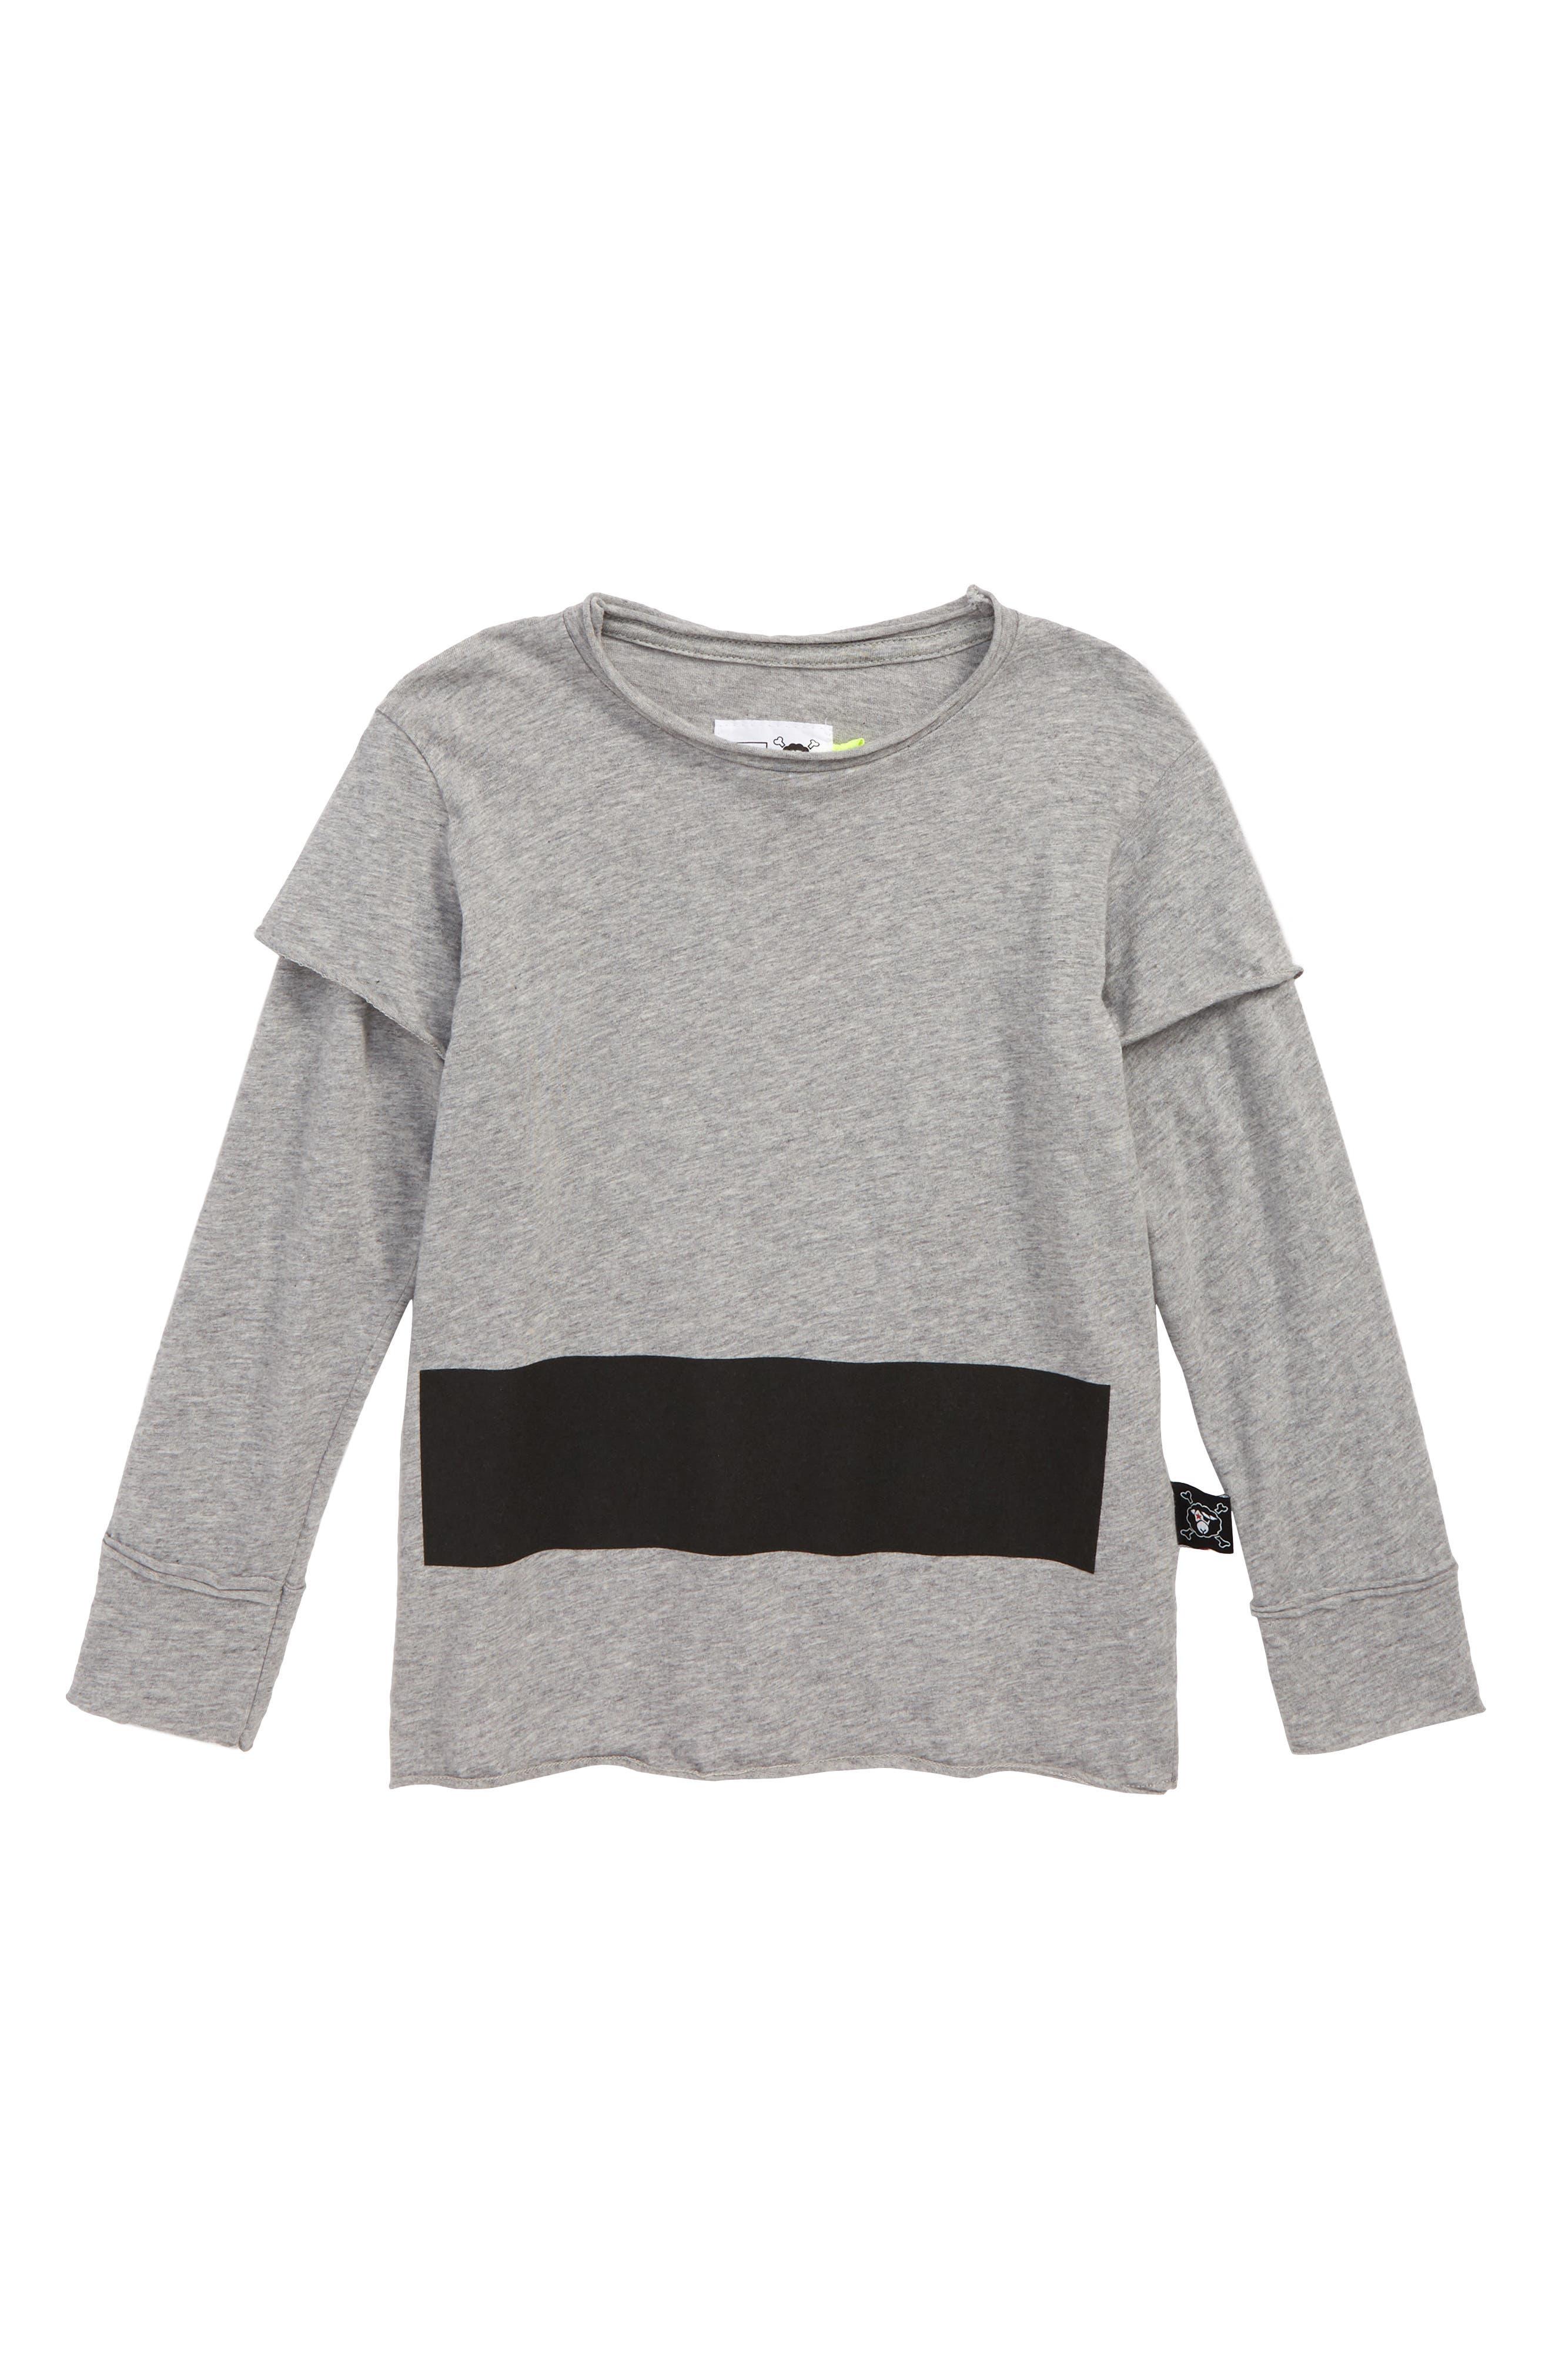 Stripe Layered T-Shirt,                             Main thumbnail 1, color,                             HEATHER GREY